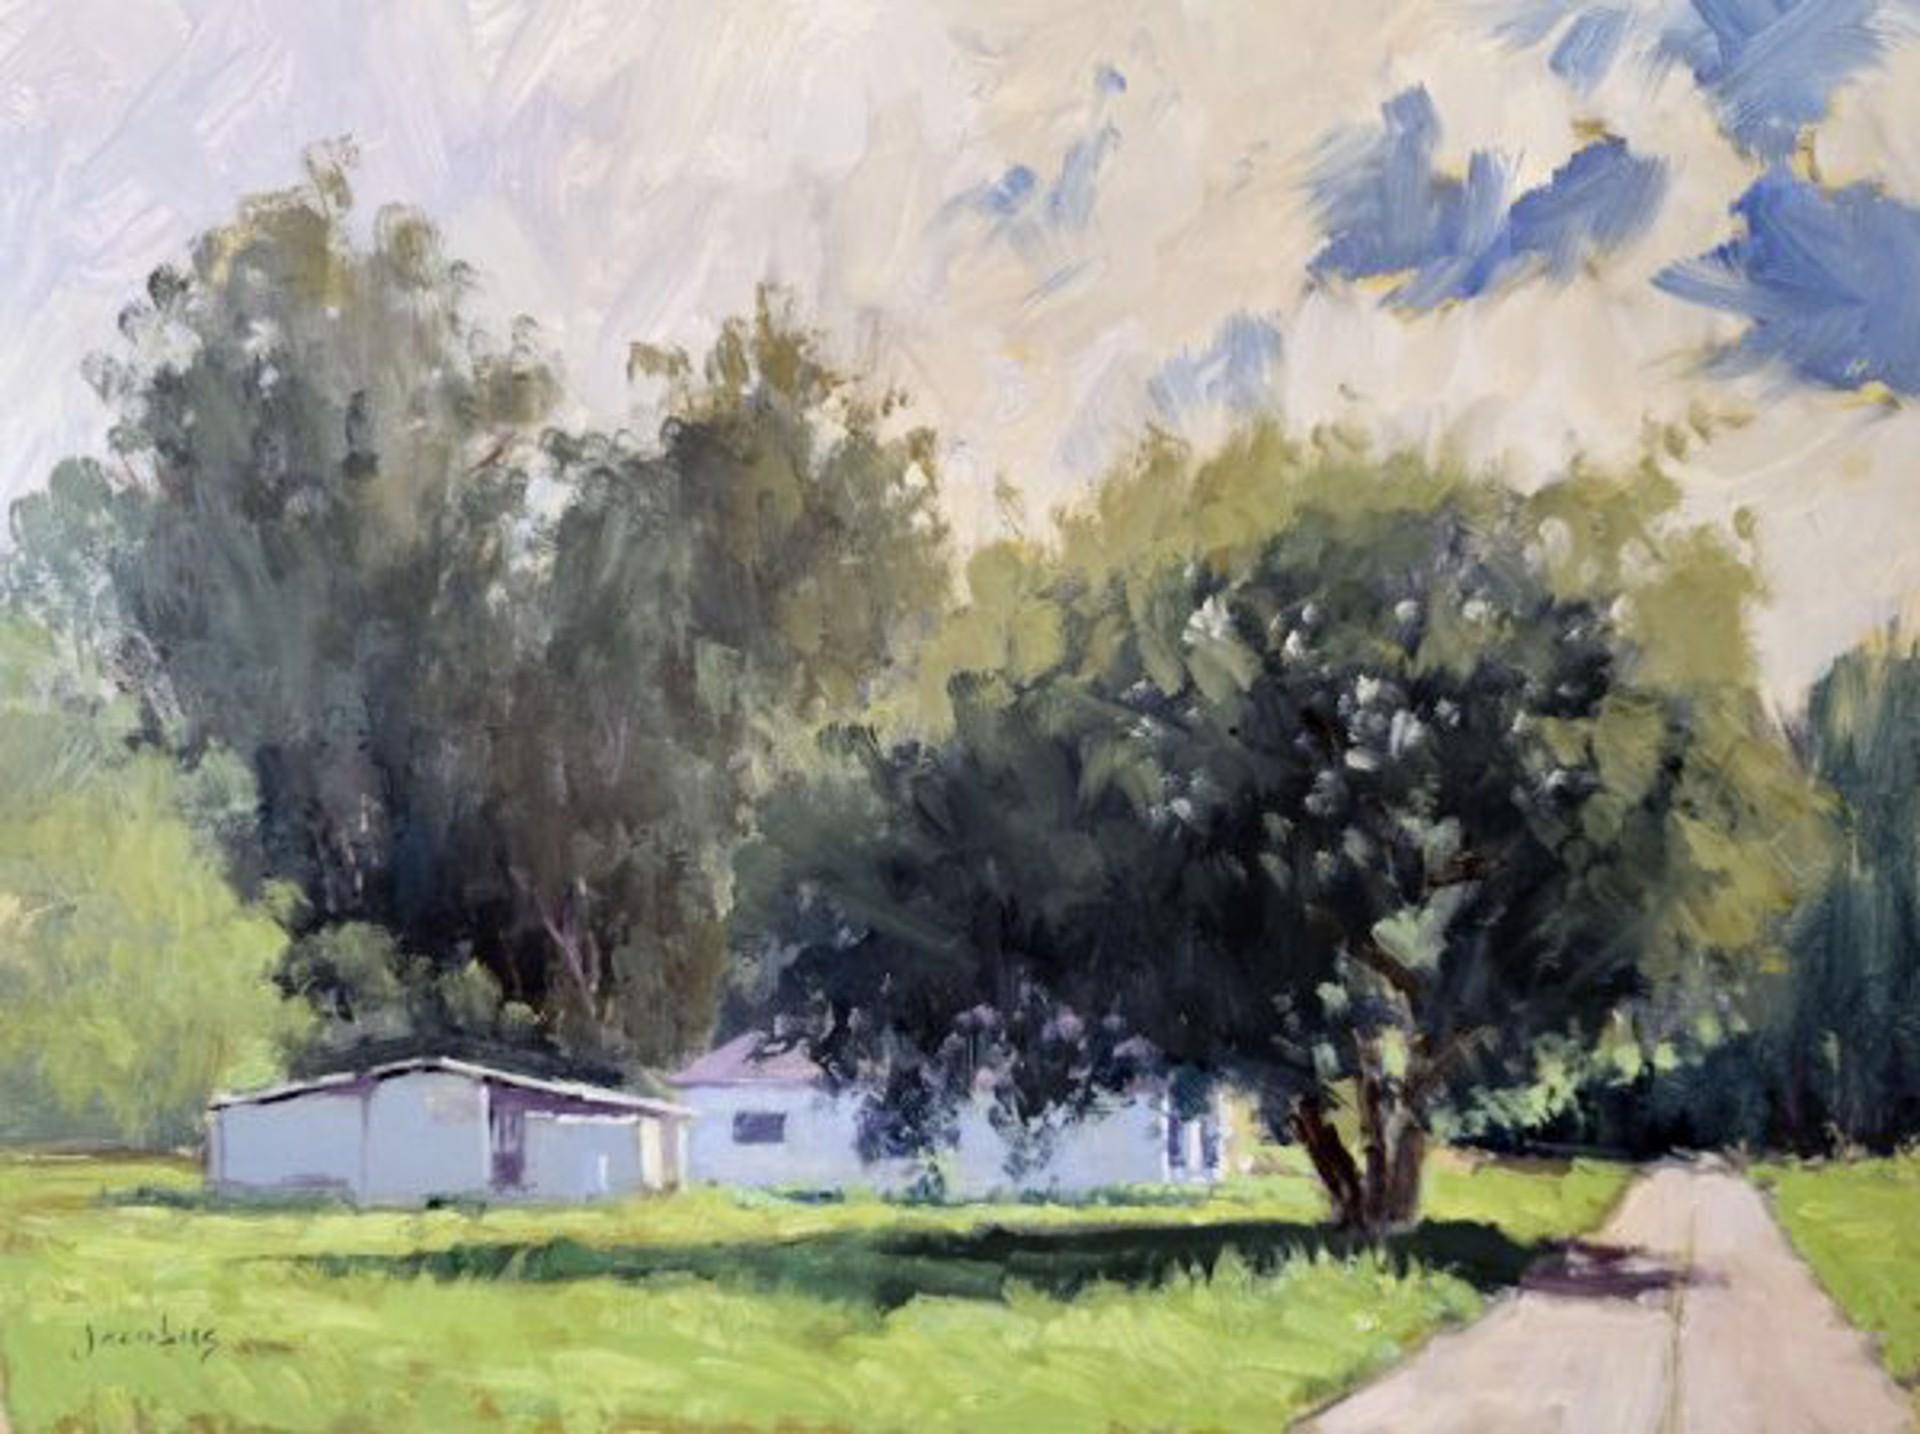 La Salle Farm House by Jacobus Baas